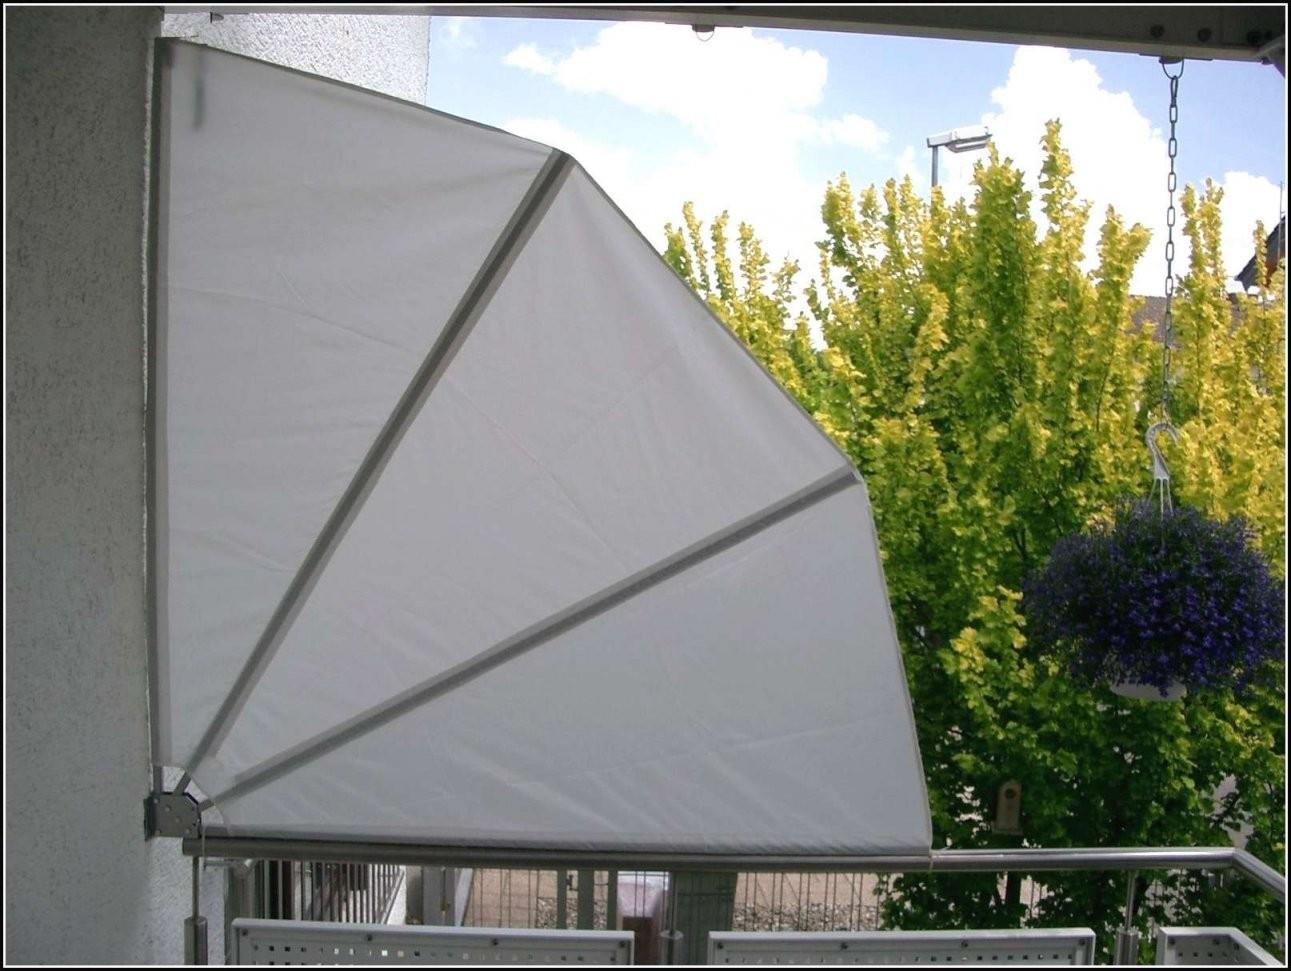 Sonnenschutz Balkon Ohne Bohren Genial 16 Sichtschutz Balkon Konzept von Sichtschutz Für Balkon Ohne Bohren Bild